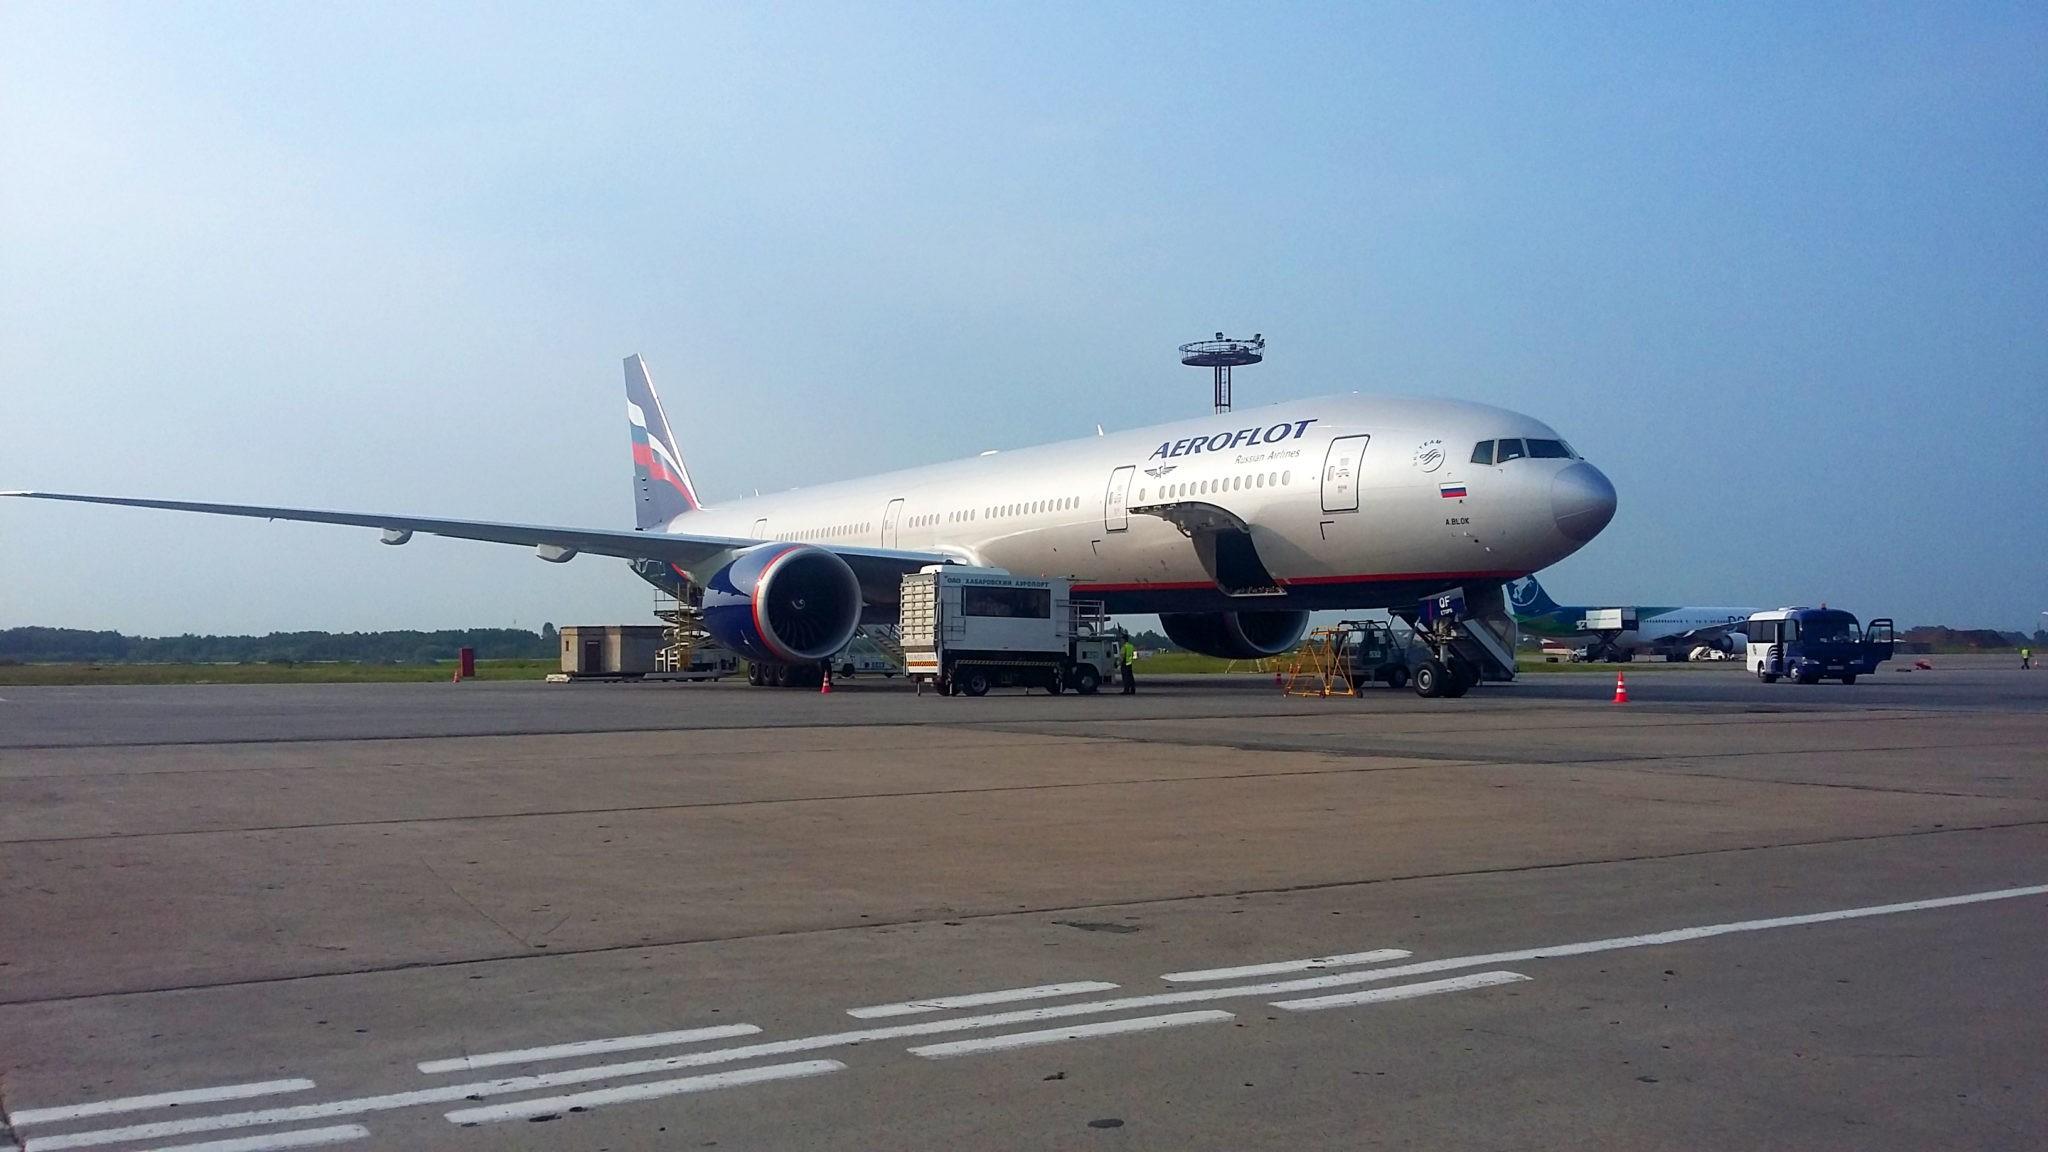 Boieng 777-300ER, AFL, VQ-BQF (А. Блок) рейсом 1710/1711 - Москва (ШРМ) - Хабаровск - Москва (ШРМ)